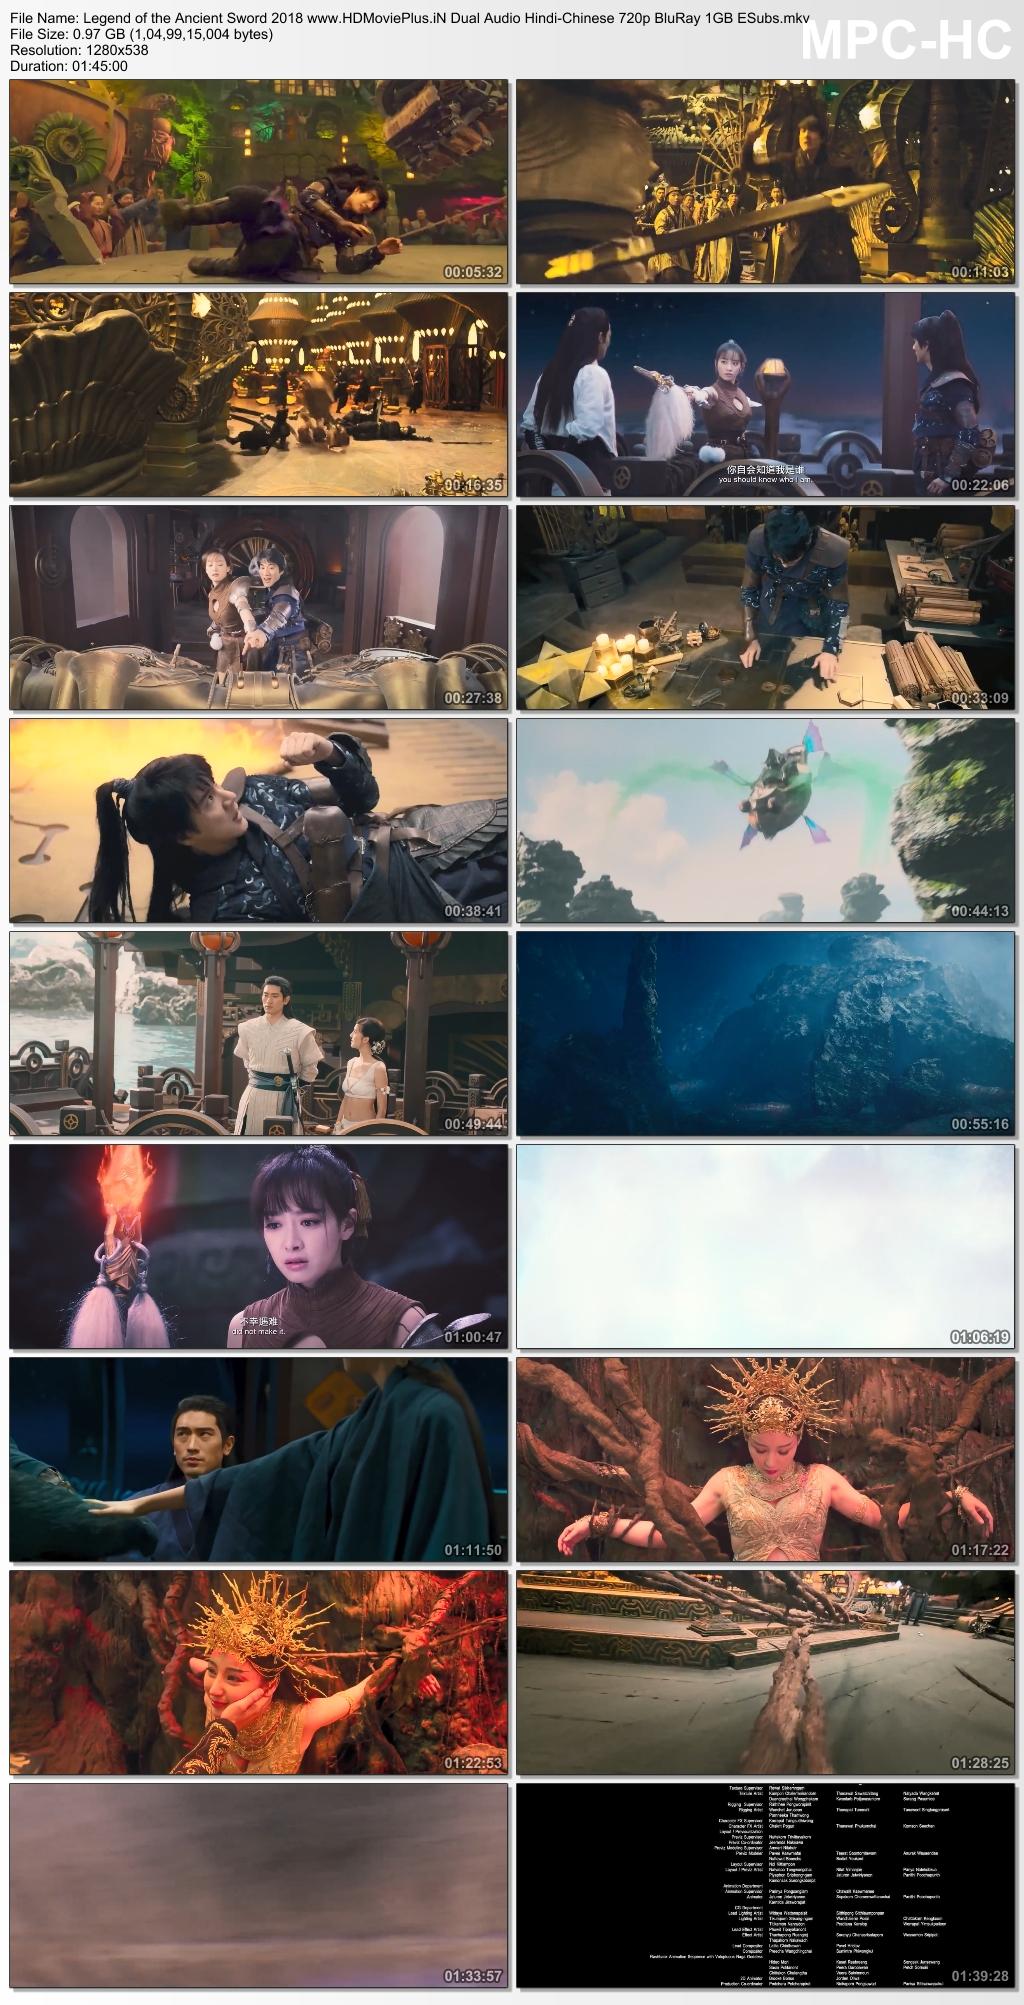 Legend of the Ancient Sword 2018 Dual Audio